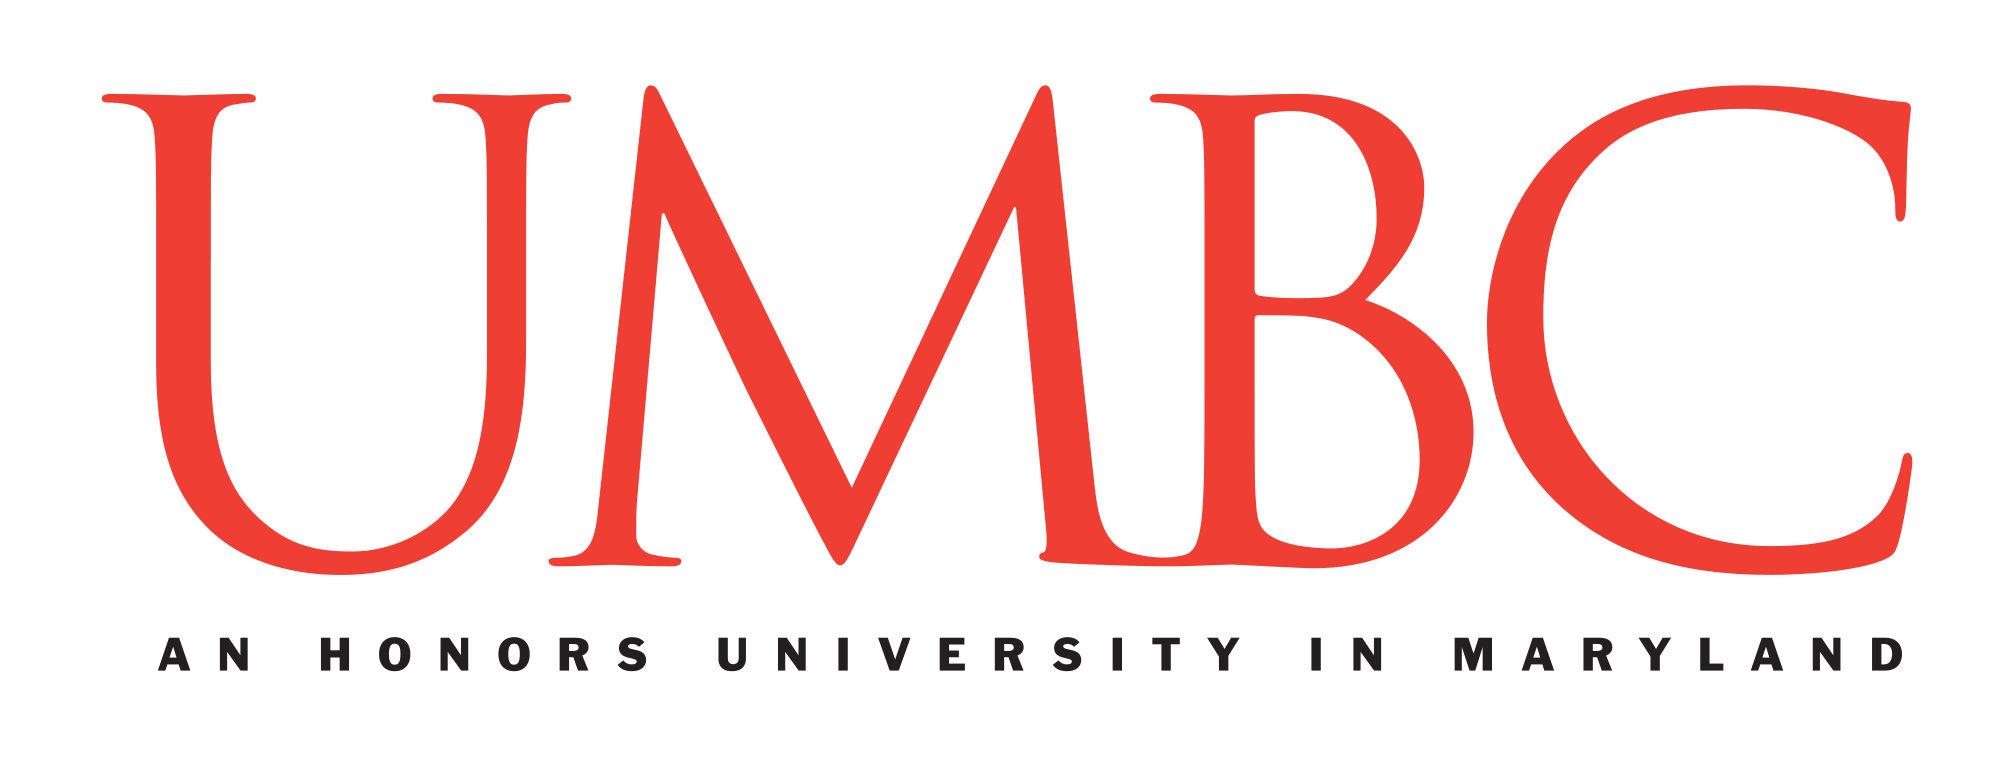 University of Maryland, Baltimore Co